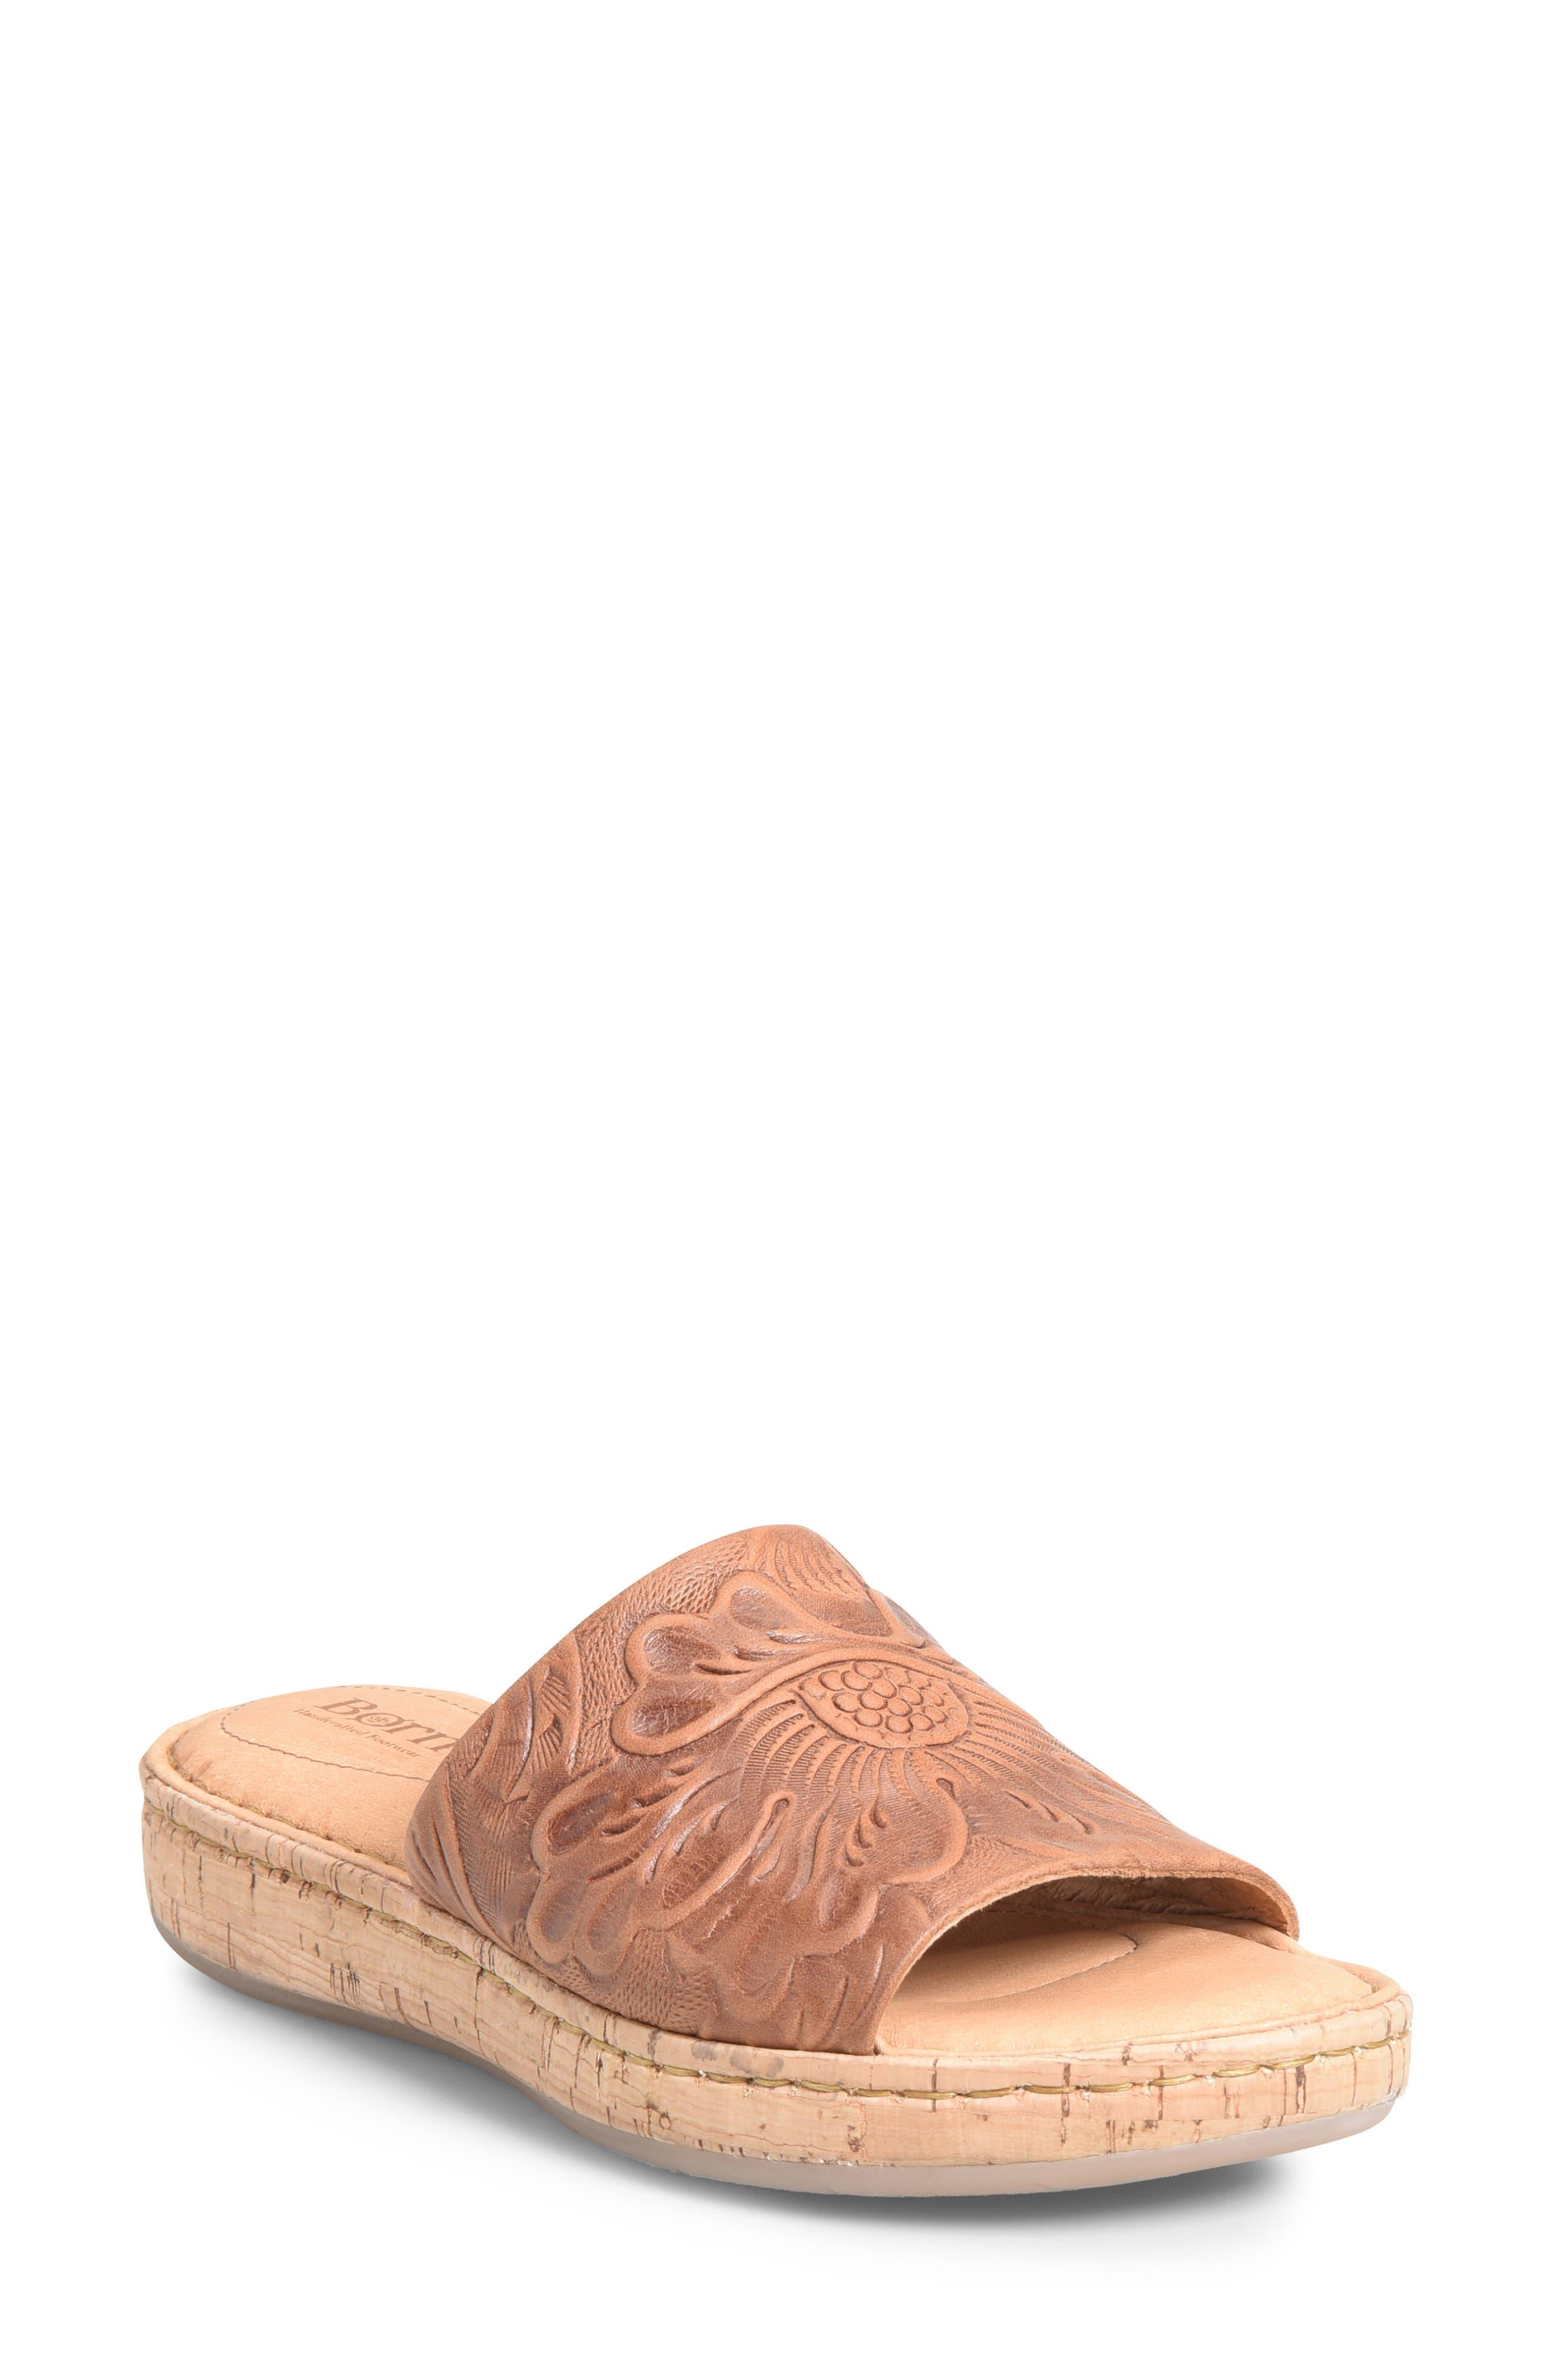 B?rn Fish Lake Tooled Slide Sandal, Brown